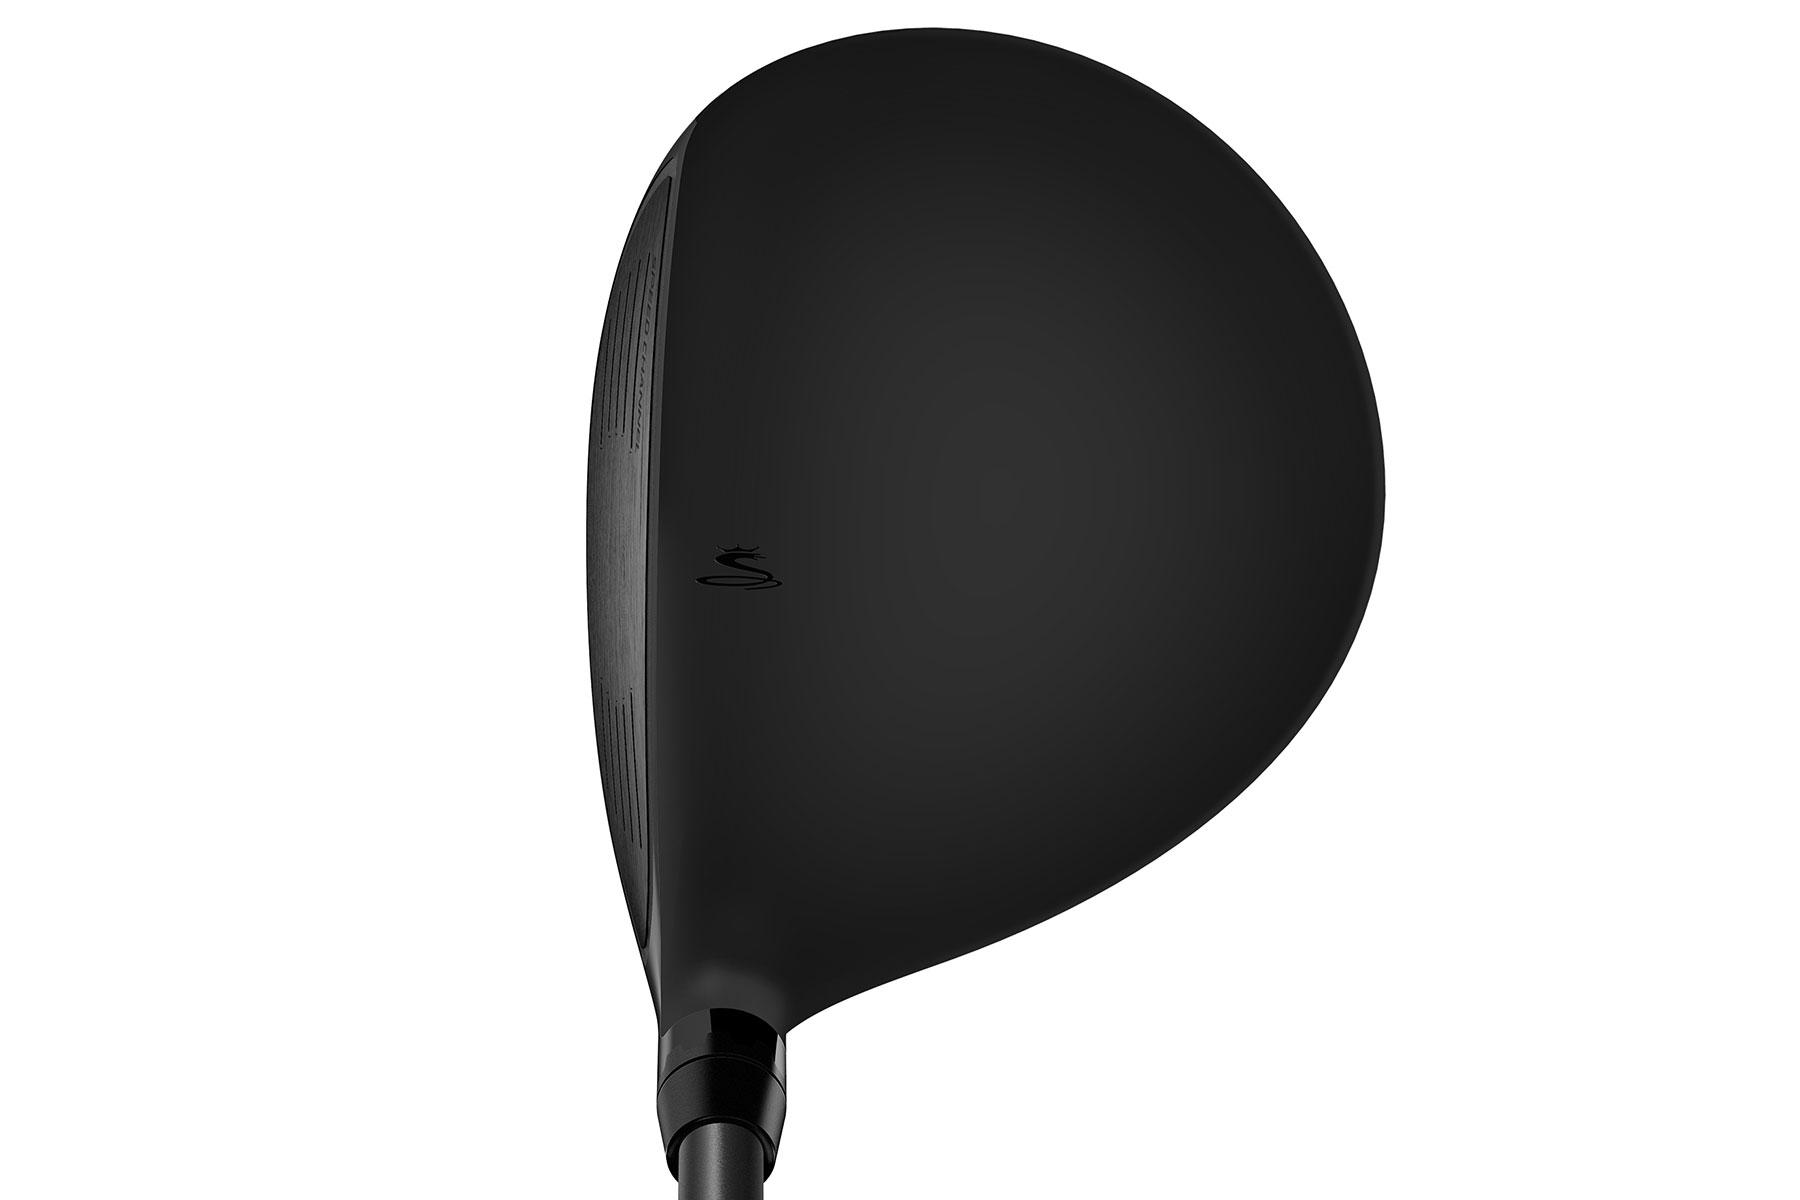 Cobra Golf King Ltd Black Fairway Wood Online Golf